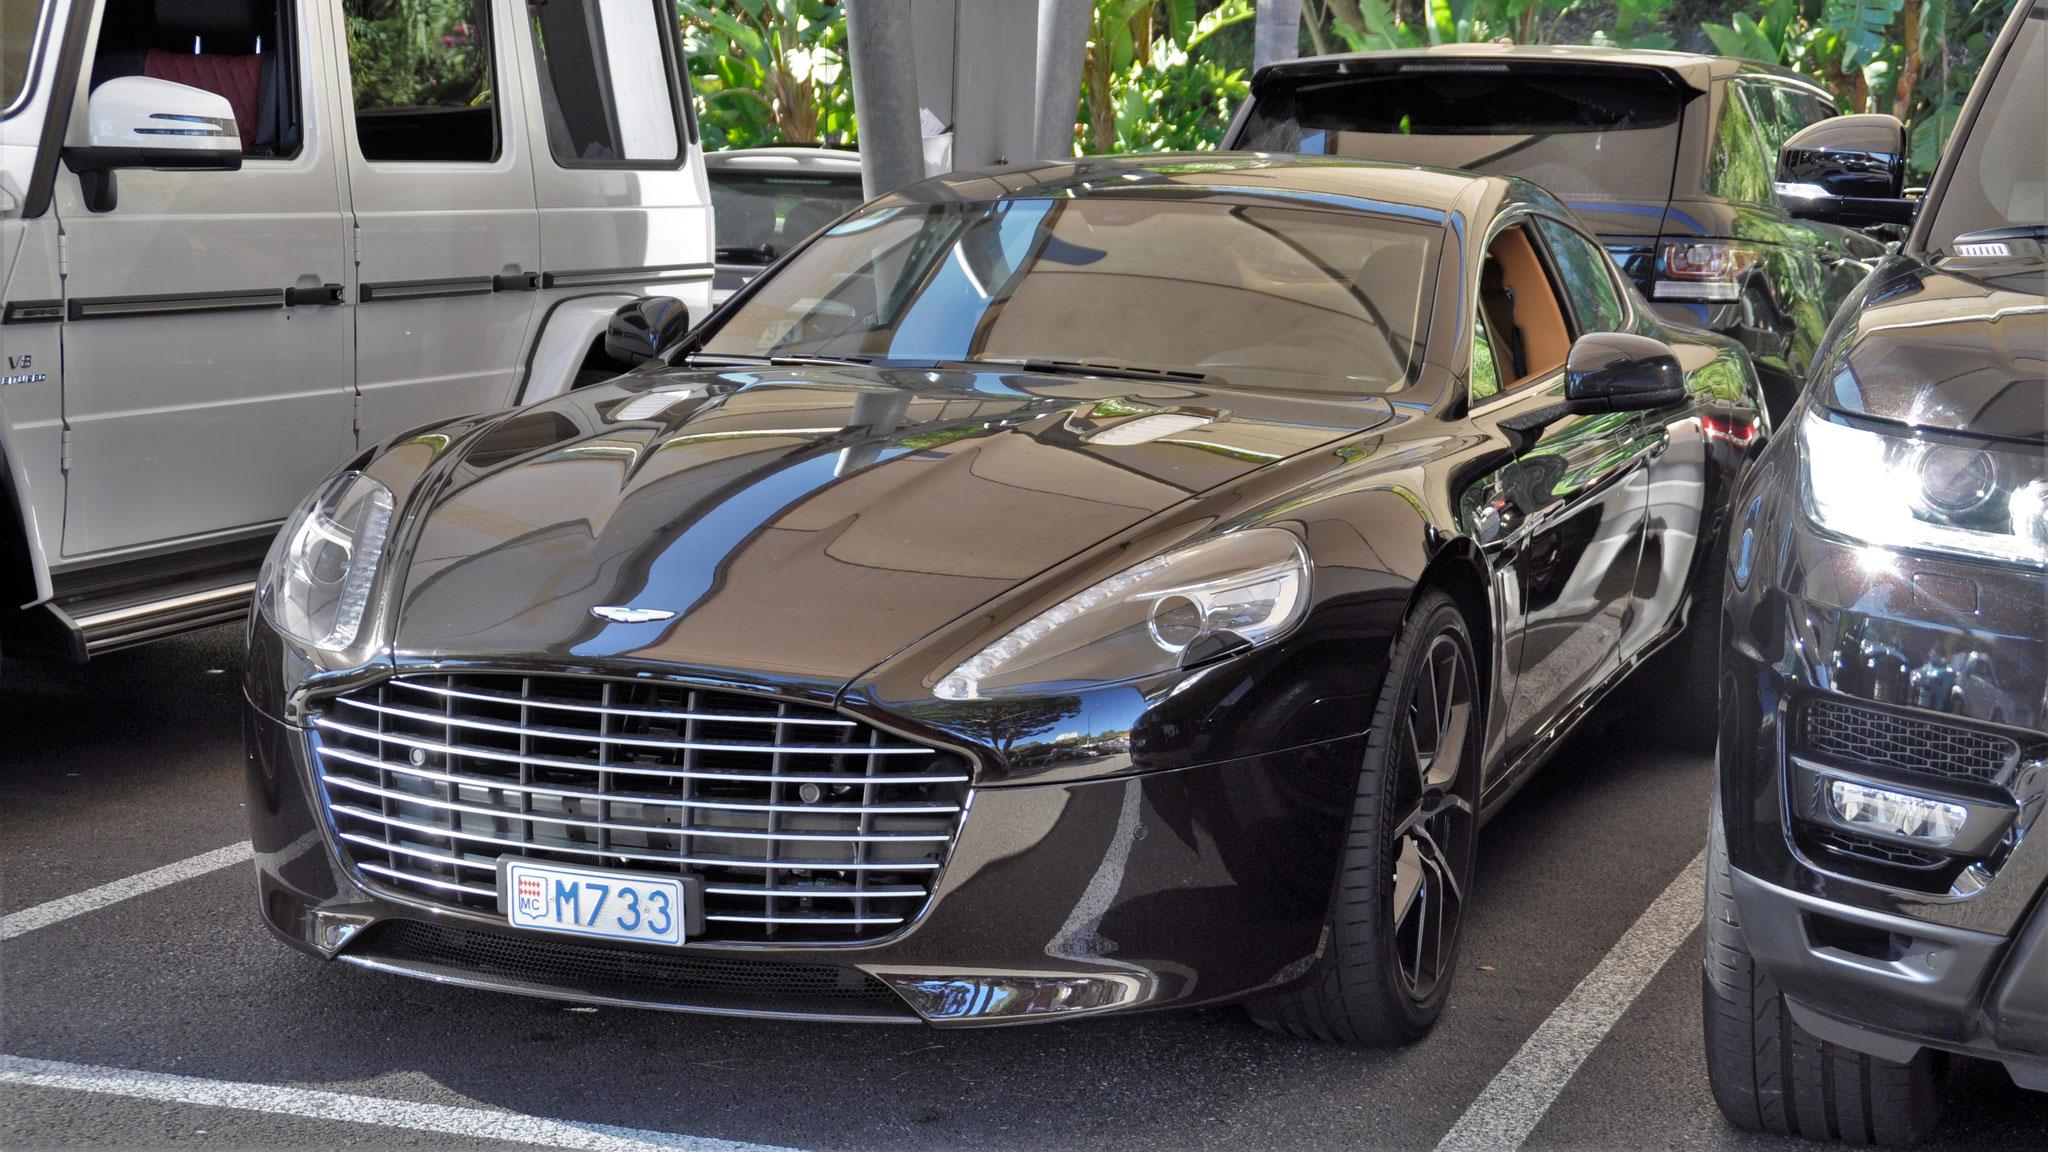 Aston Martin Rapide S - M733 (MC)